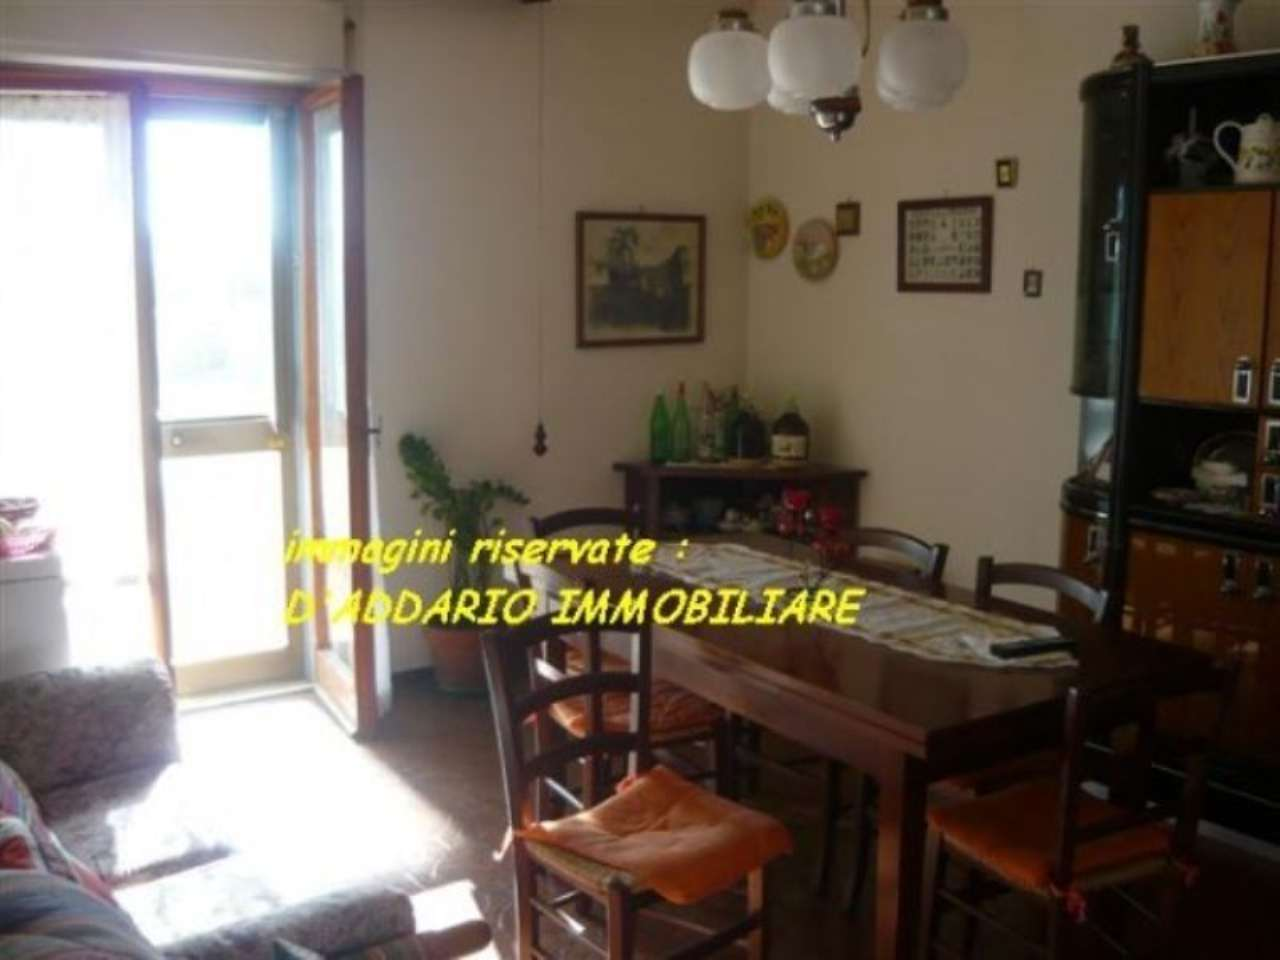 -Albinia- Appartamento al 3° piano con 2 camre, bagno, cantina. RIF.656/A